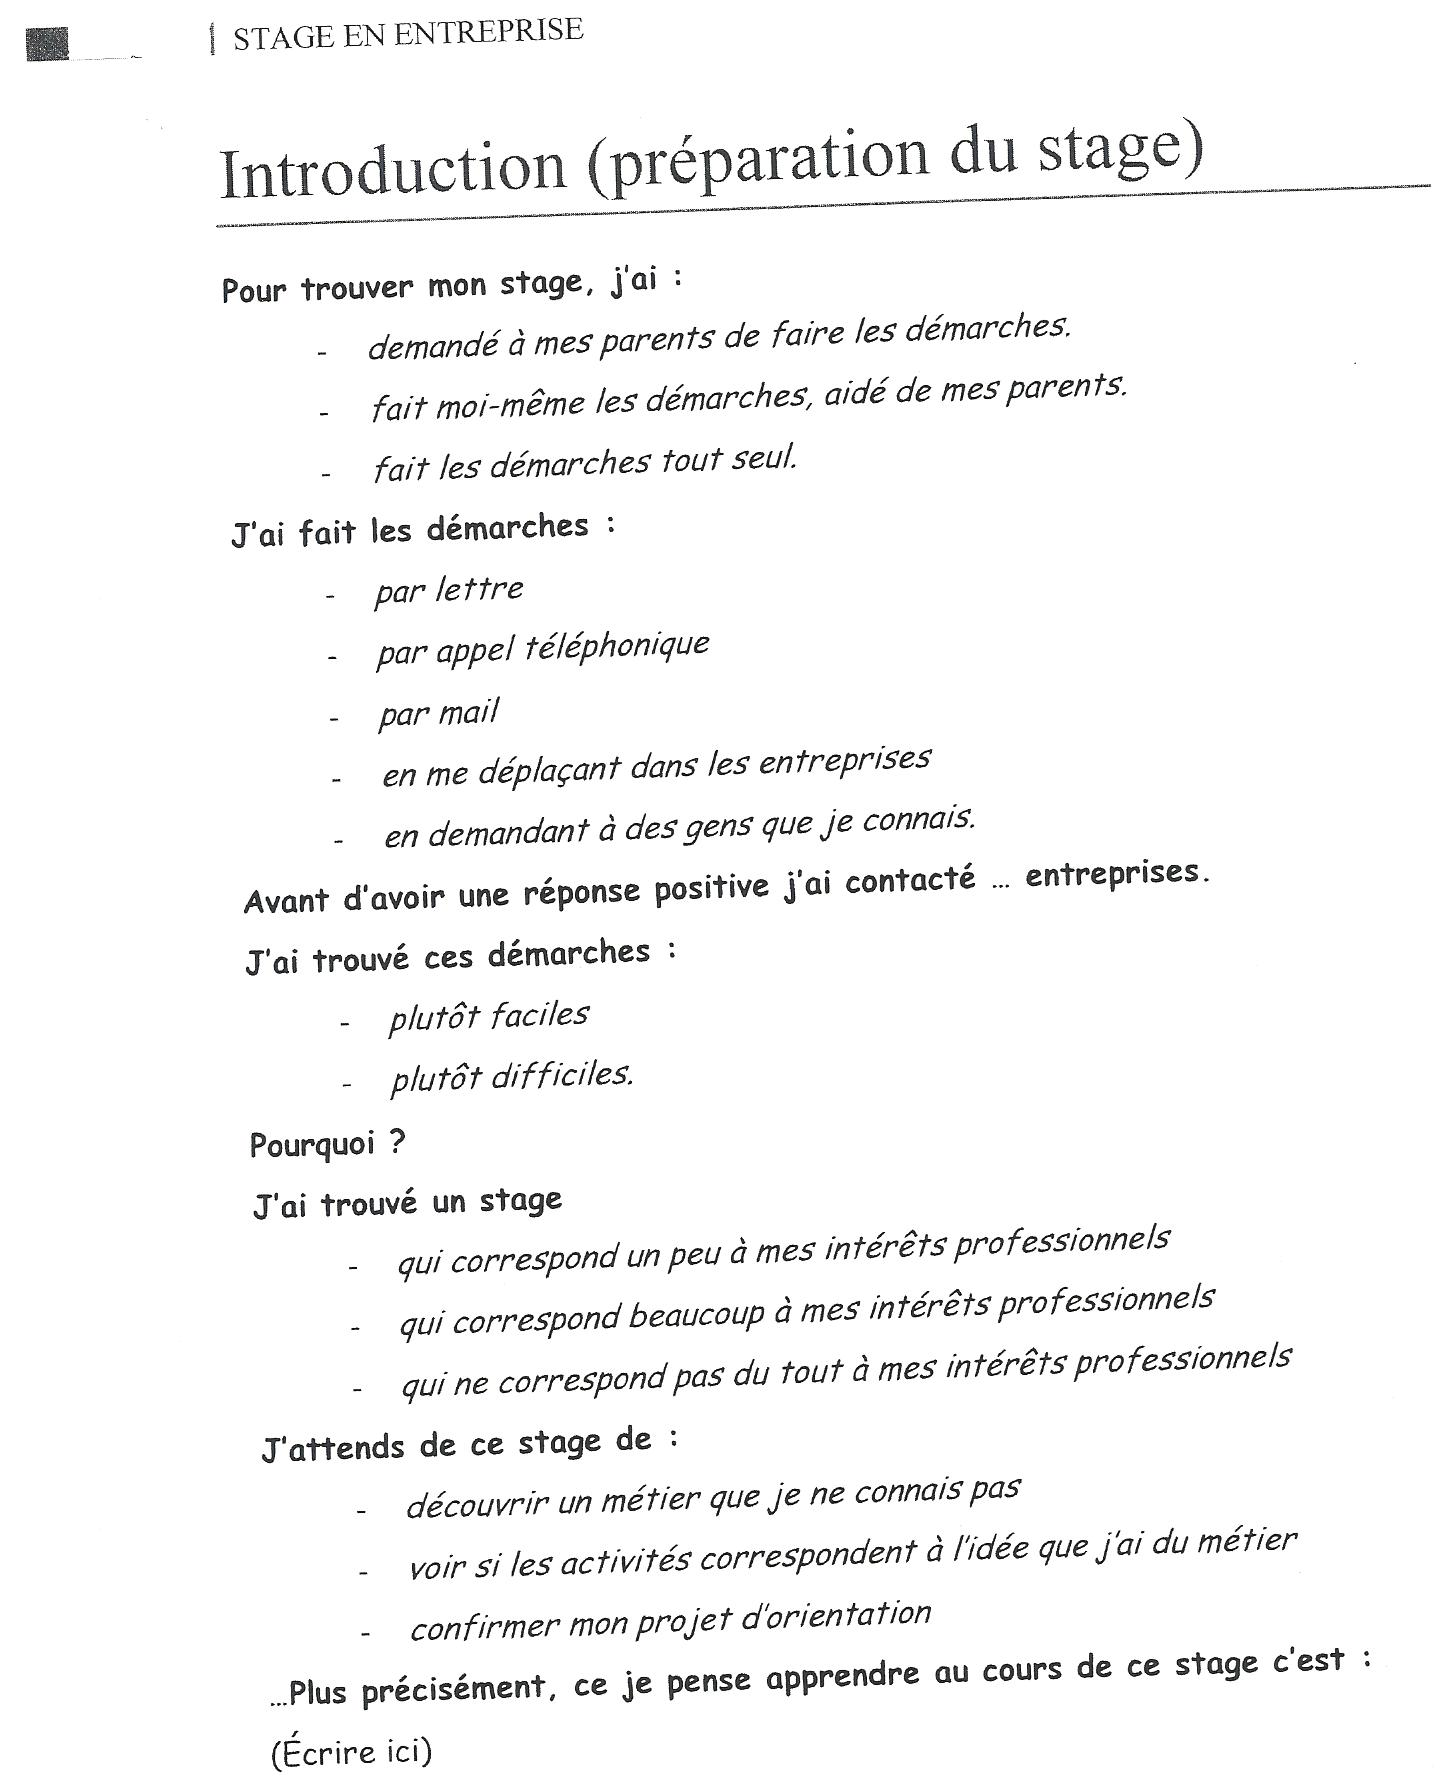 Rapport de stage en cabinet d 39 expertise comptable oboulo - Stage en cabinet d expertise comptable ...